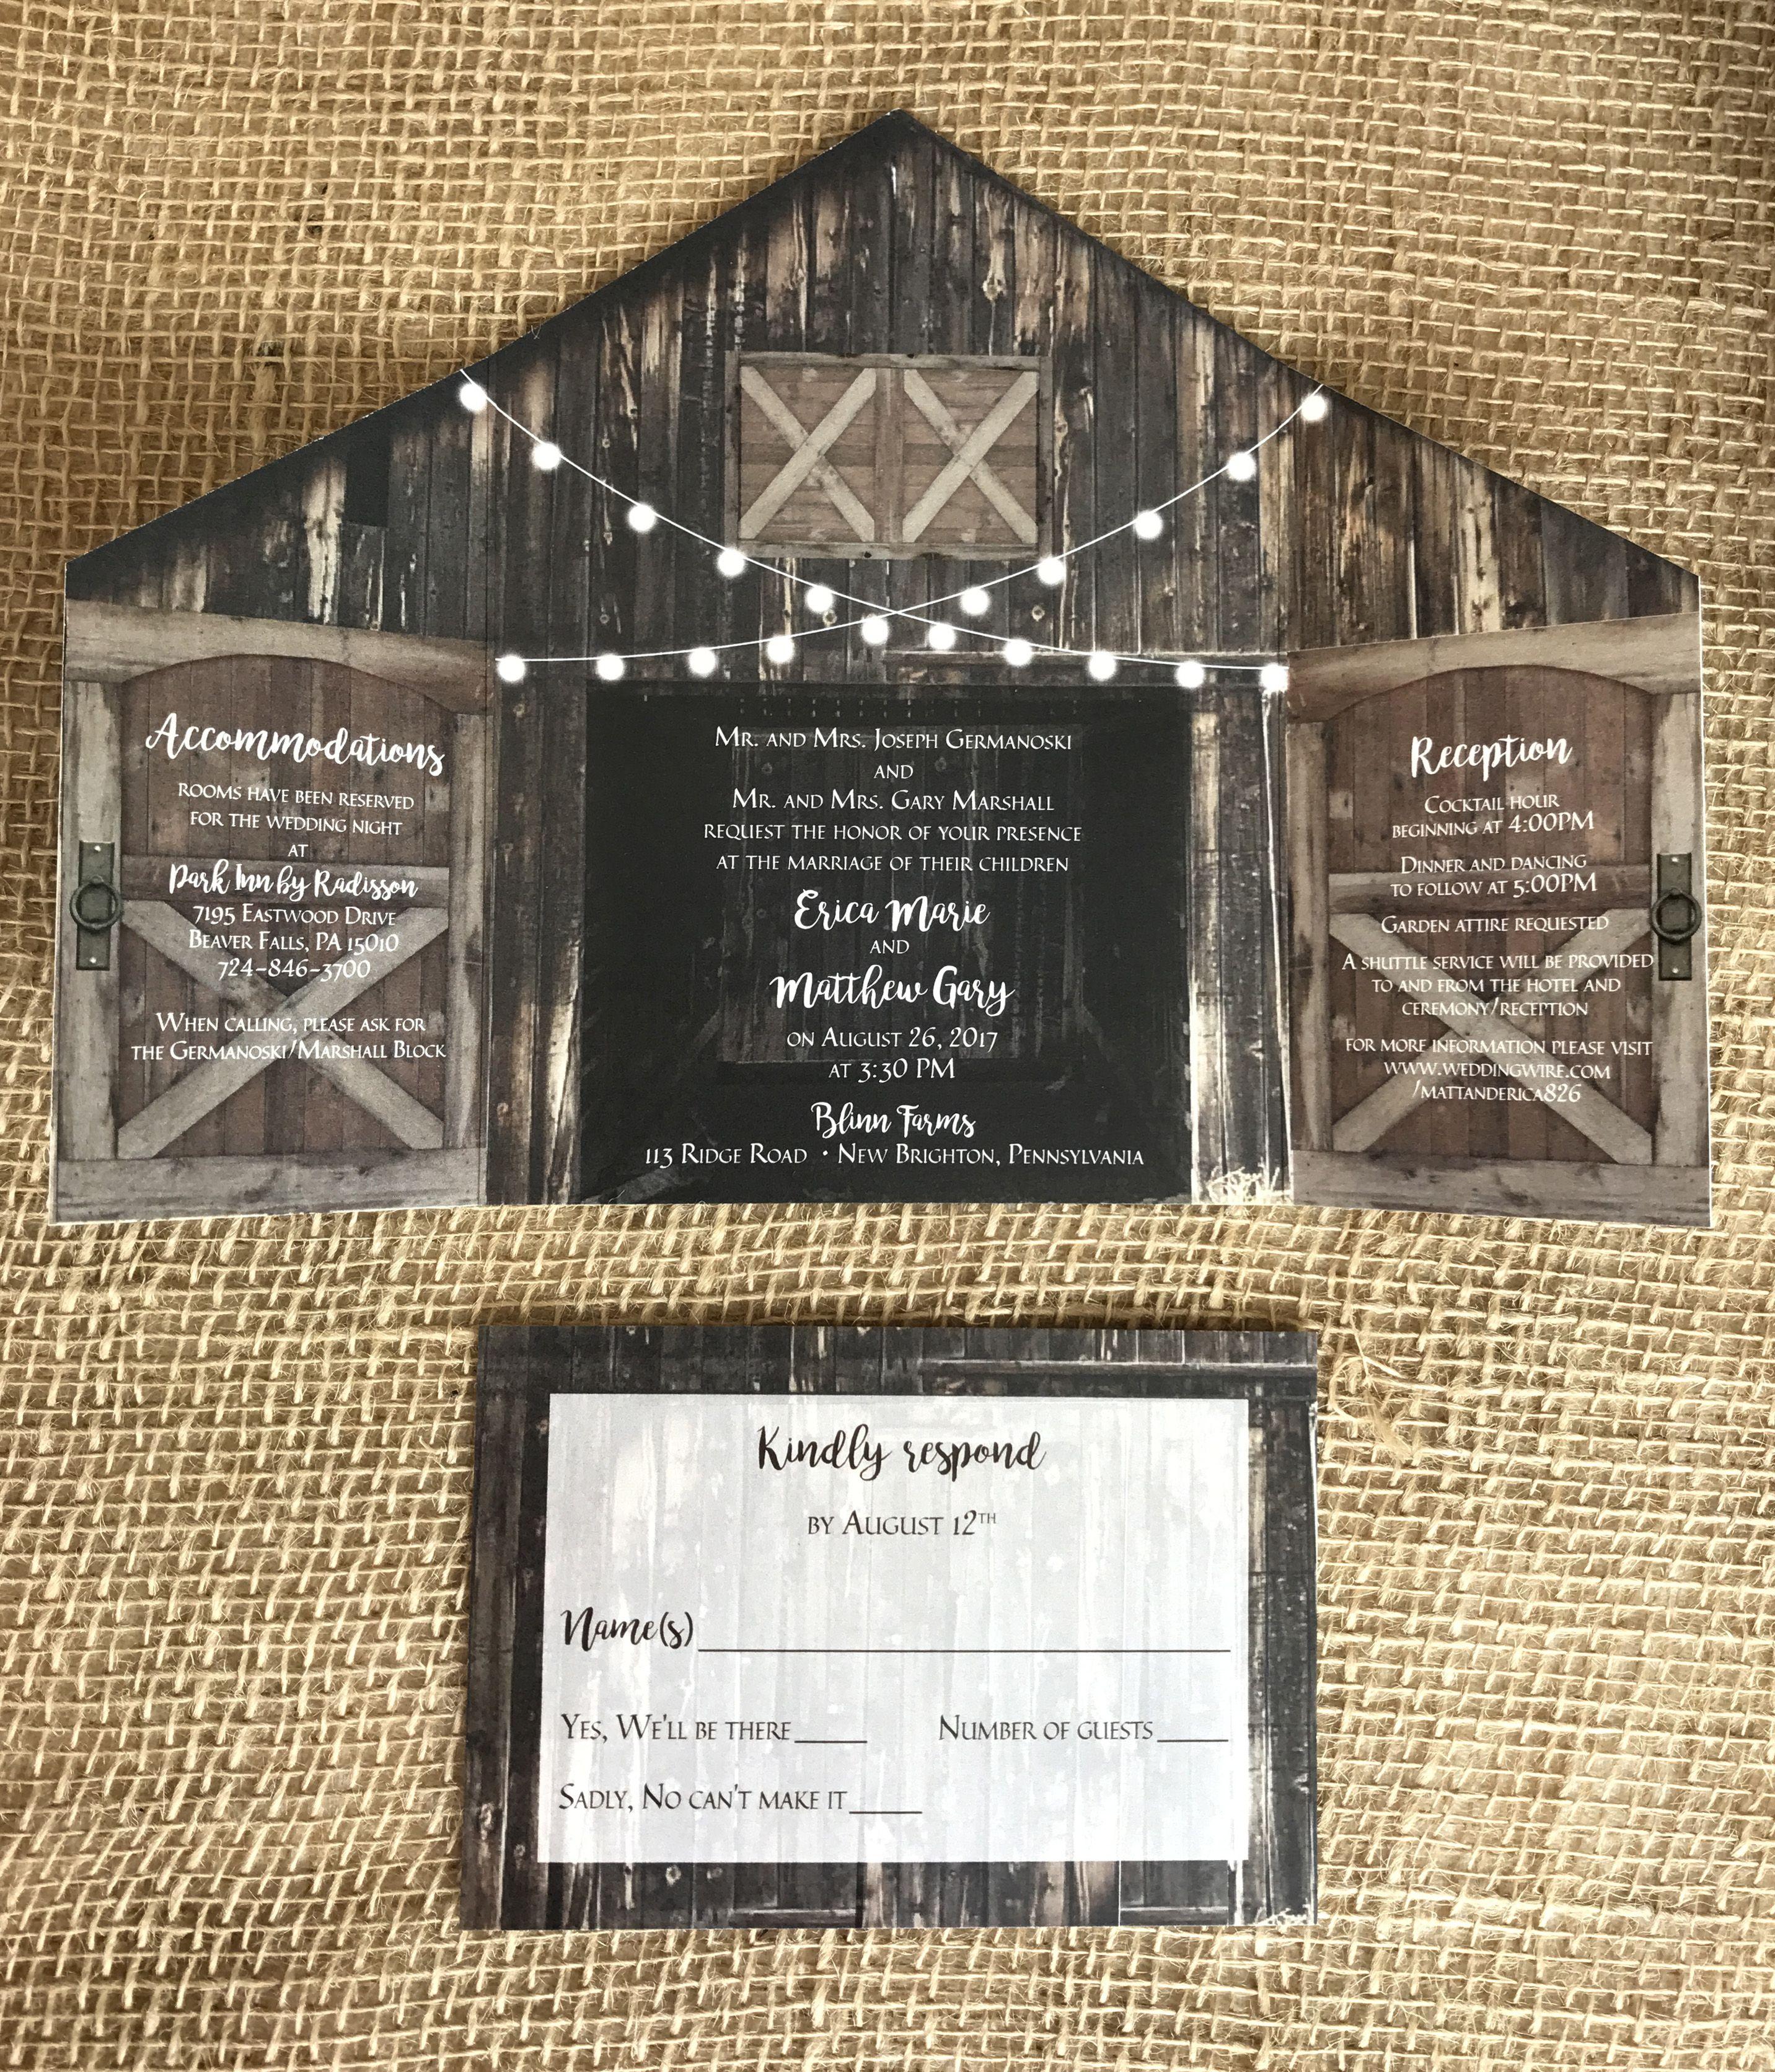 Rustic Barn Wedding Invitation With Folding Doors And Strings Etsy Barn Wedding Invitations Wedding Invitations Rustic Country Rustic Barn Wedding